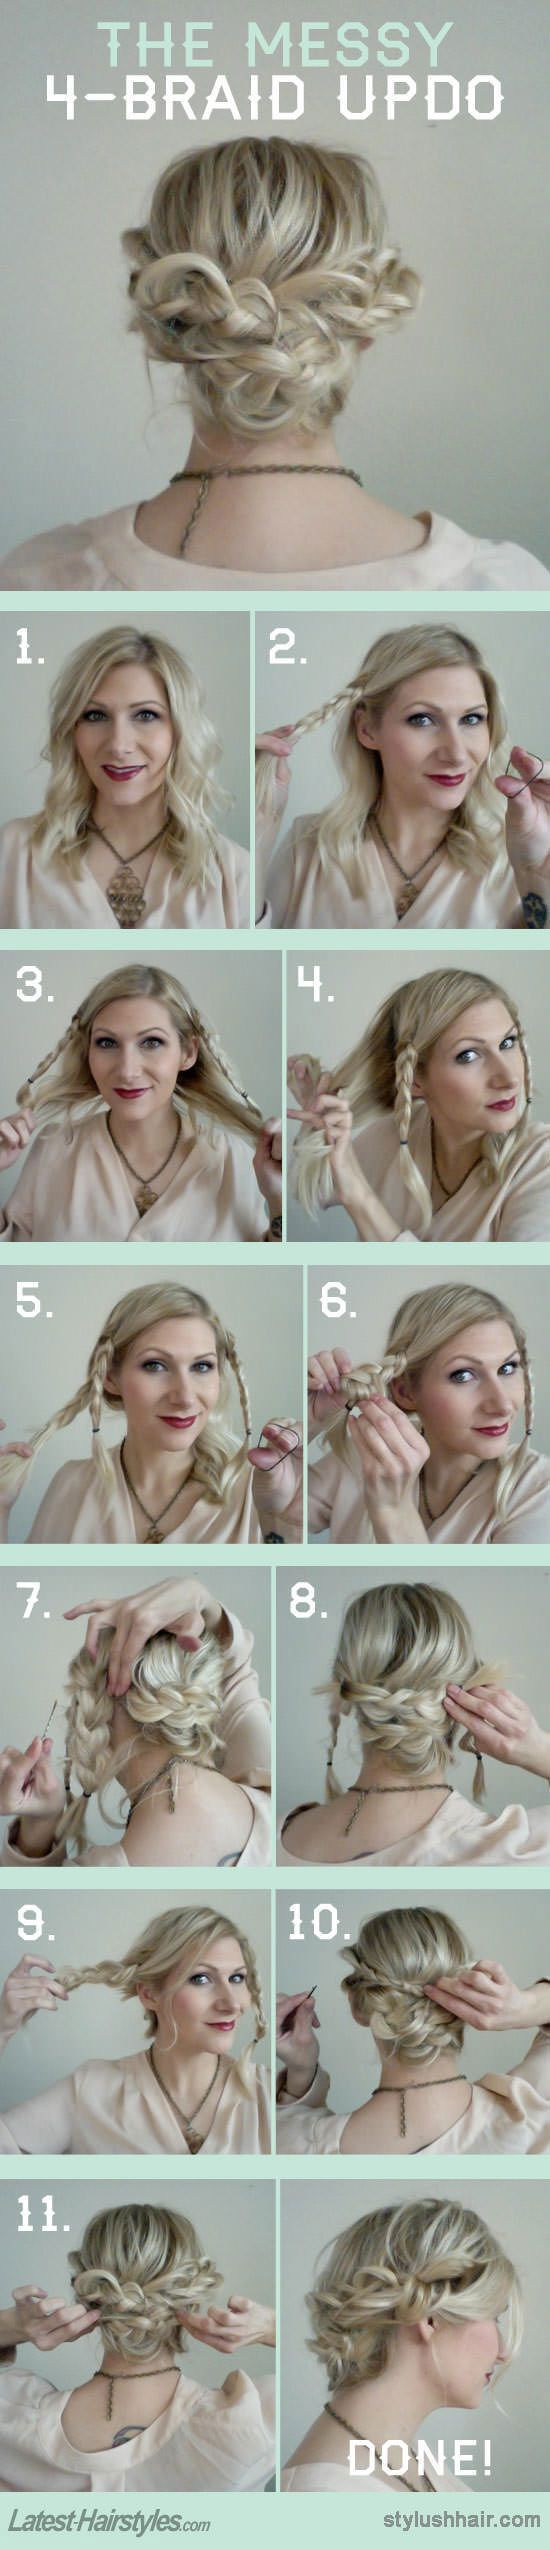 15 fresh updo's for medium length hair - popular haircuts